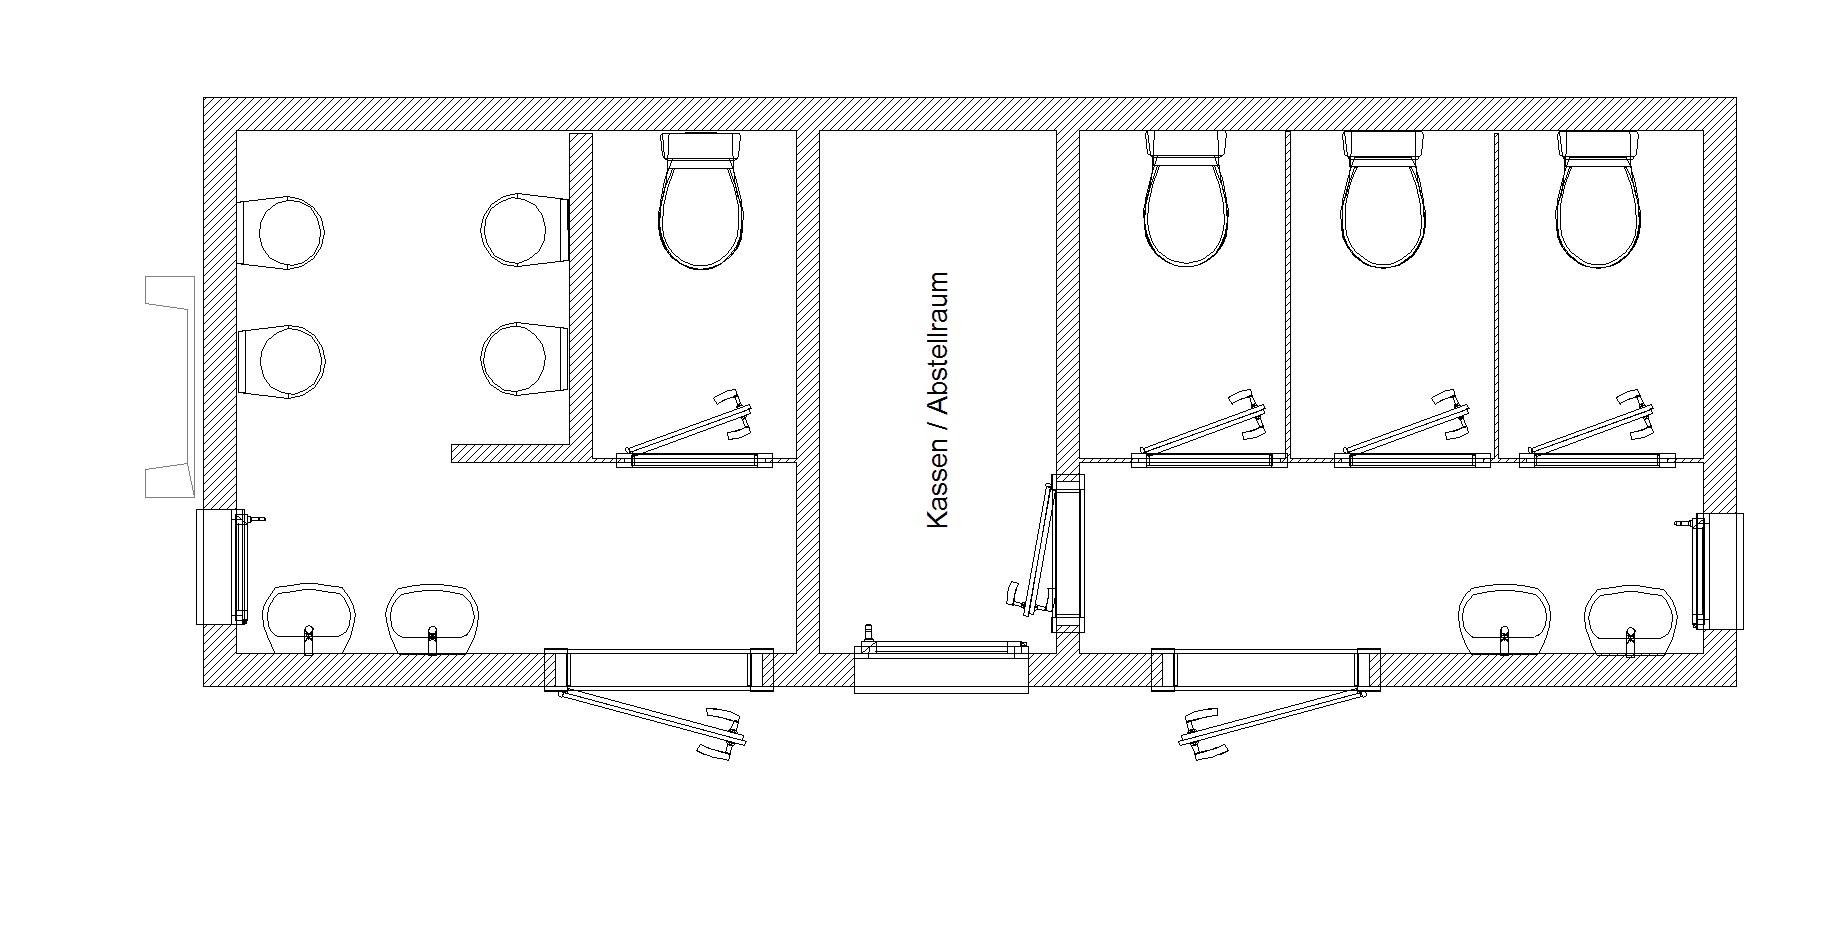 Toilette maße  Produktkatalog - Mobil-WC L 650 SW auf Abrollbasis | Berger ...